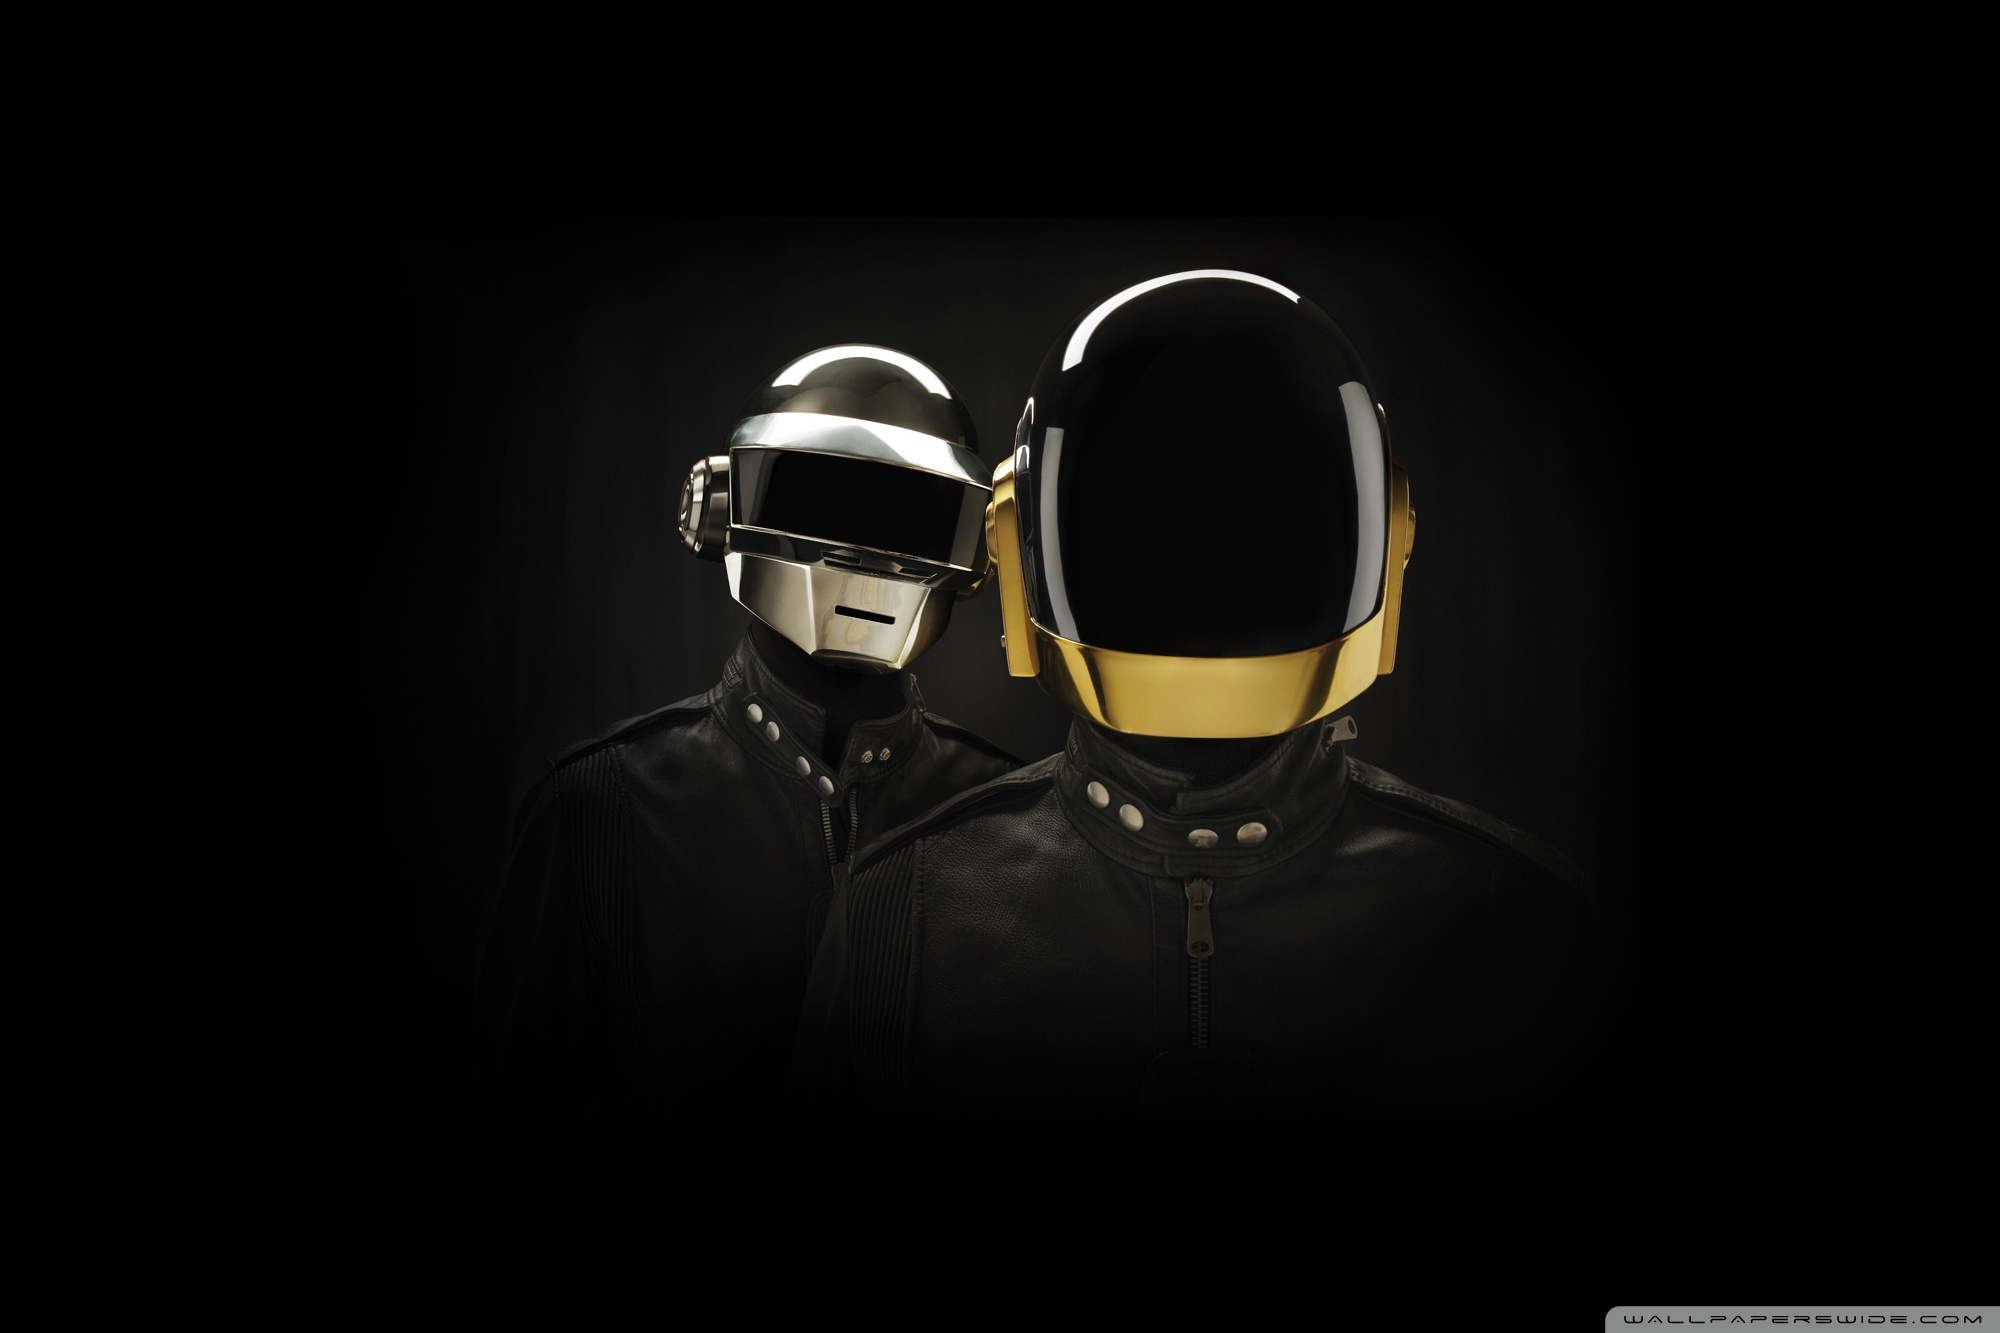 WallpapersWide com | Daft Punk HD Desktop Wallpapers for